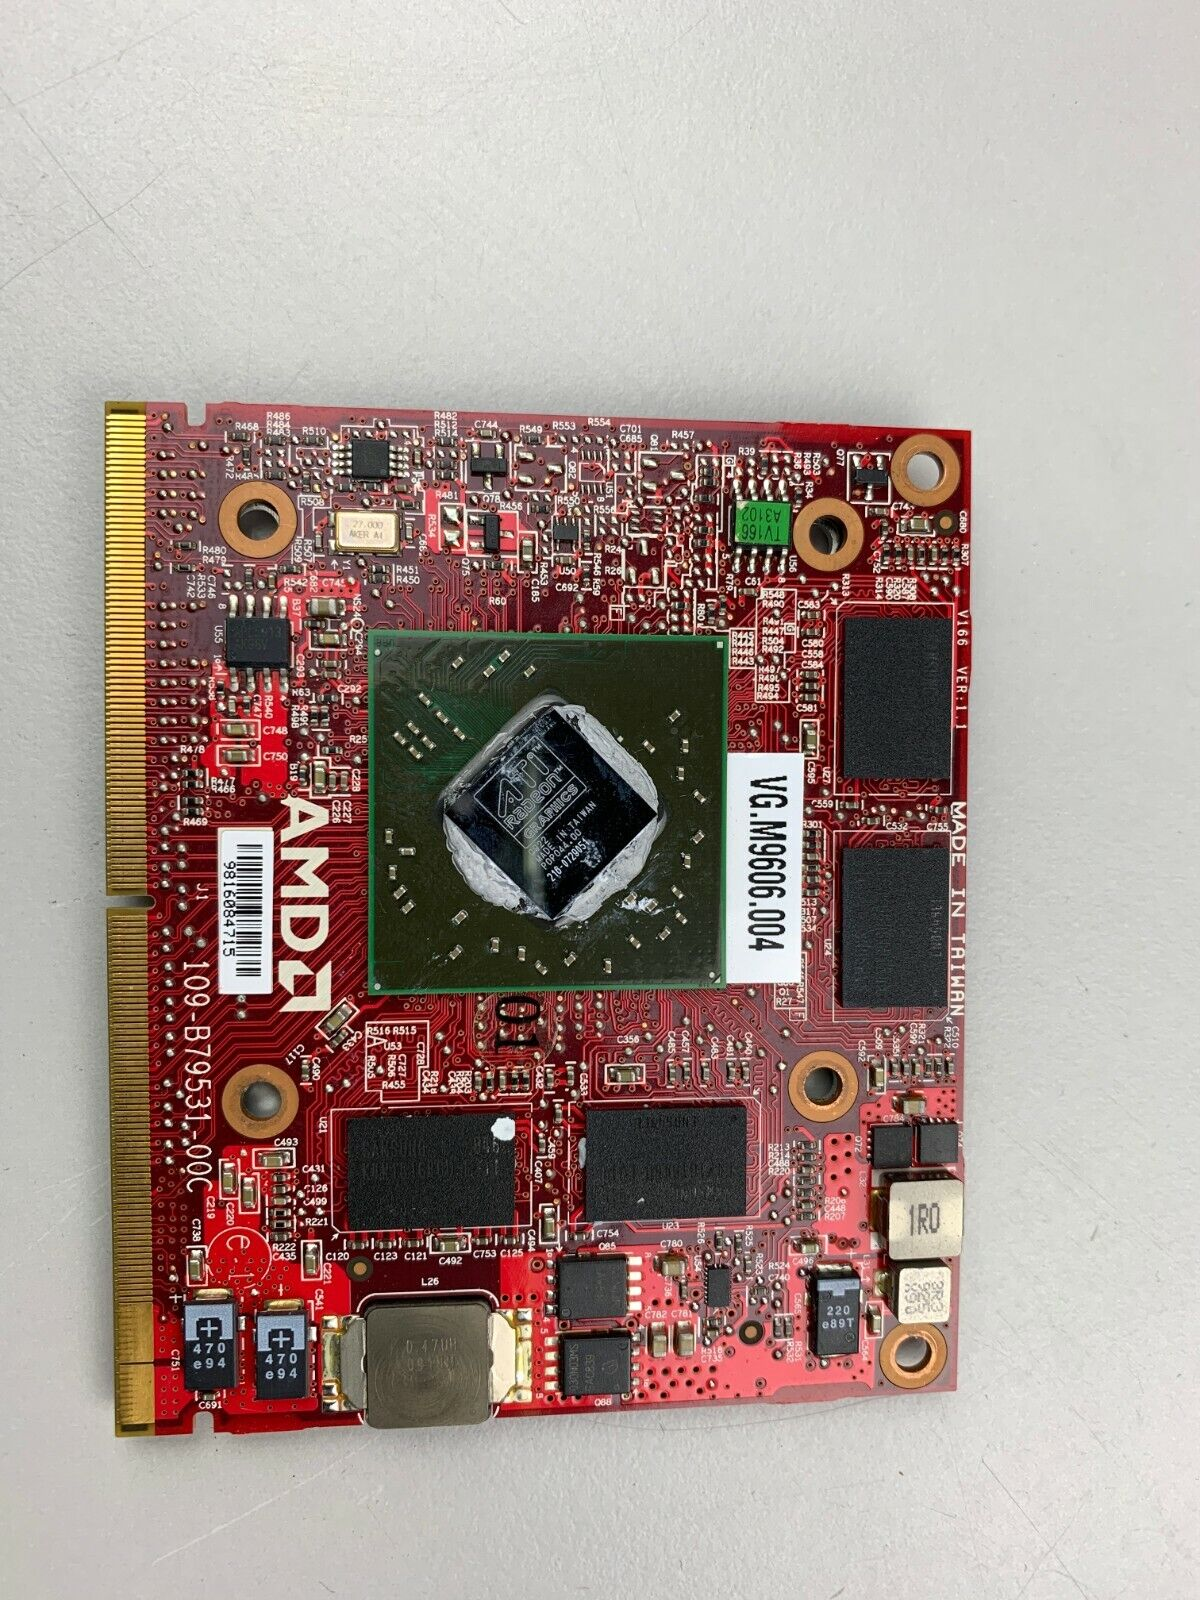 AMD ATI Mobility Radeon HD4670 DDR3 1GB Laptop Graphics Card VG.M9606.004 FAULTY